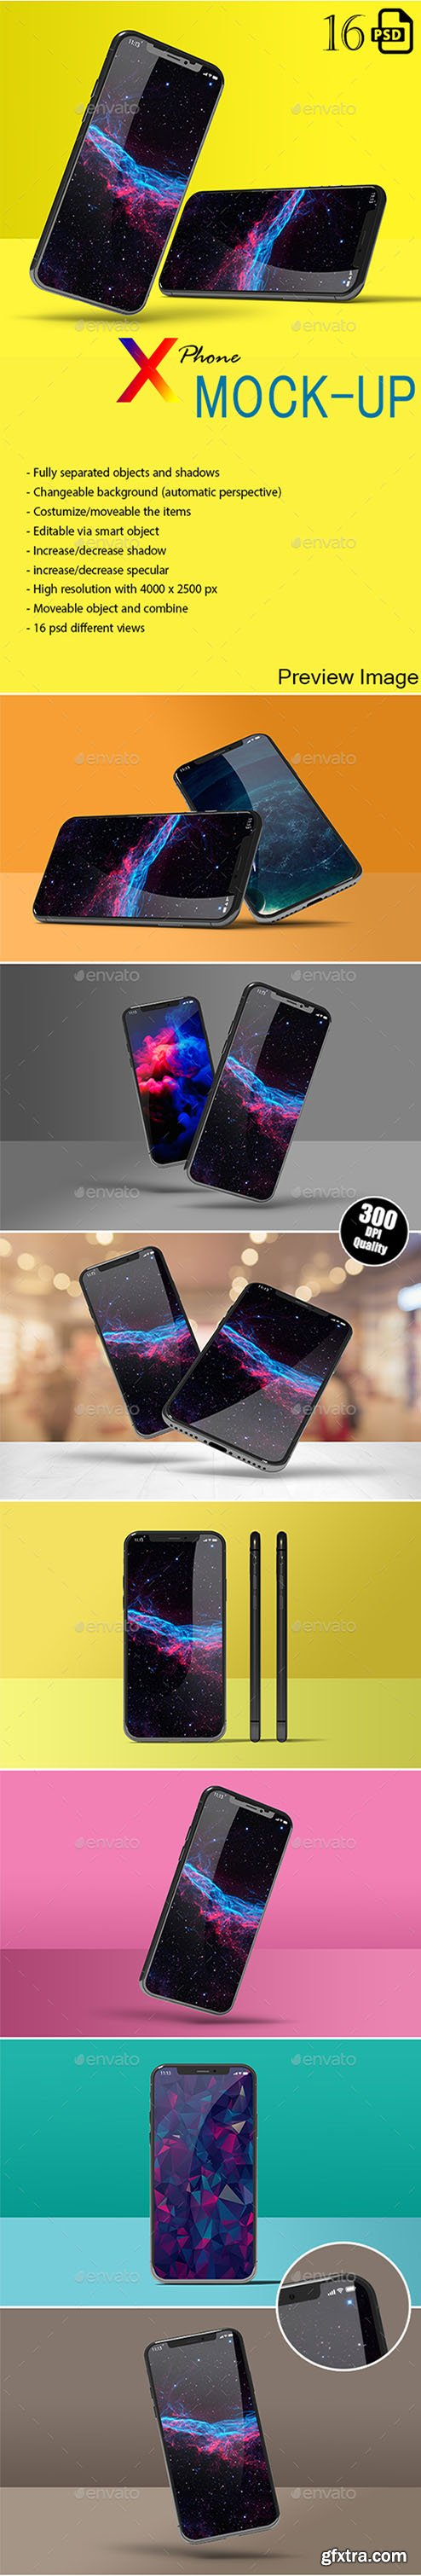 New Phone X Mockup 22921310